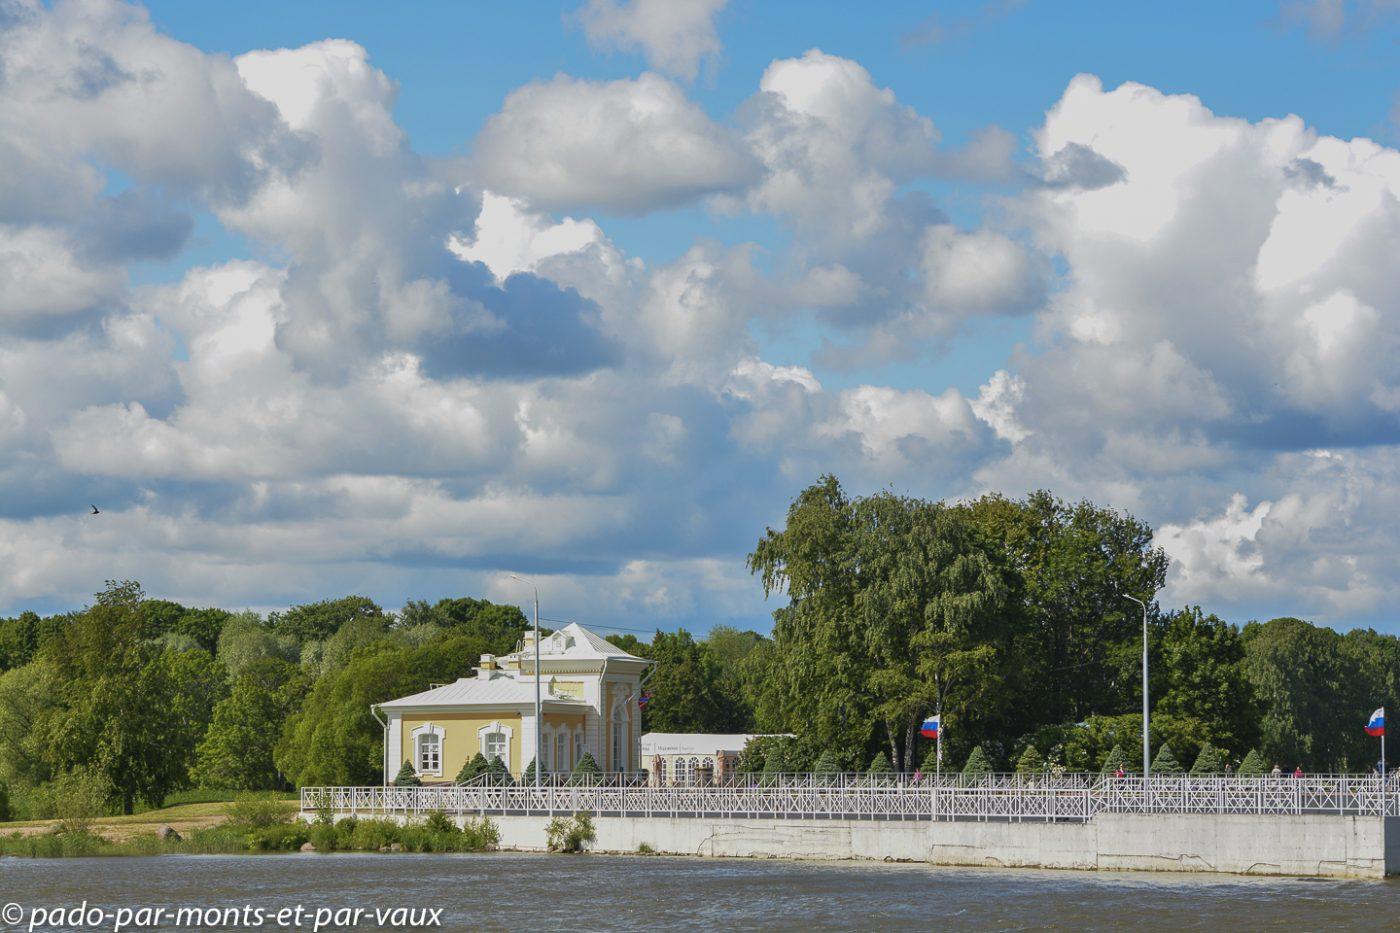 2015 - Arrivée à Peterhof